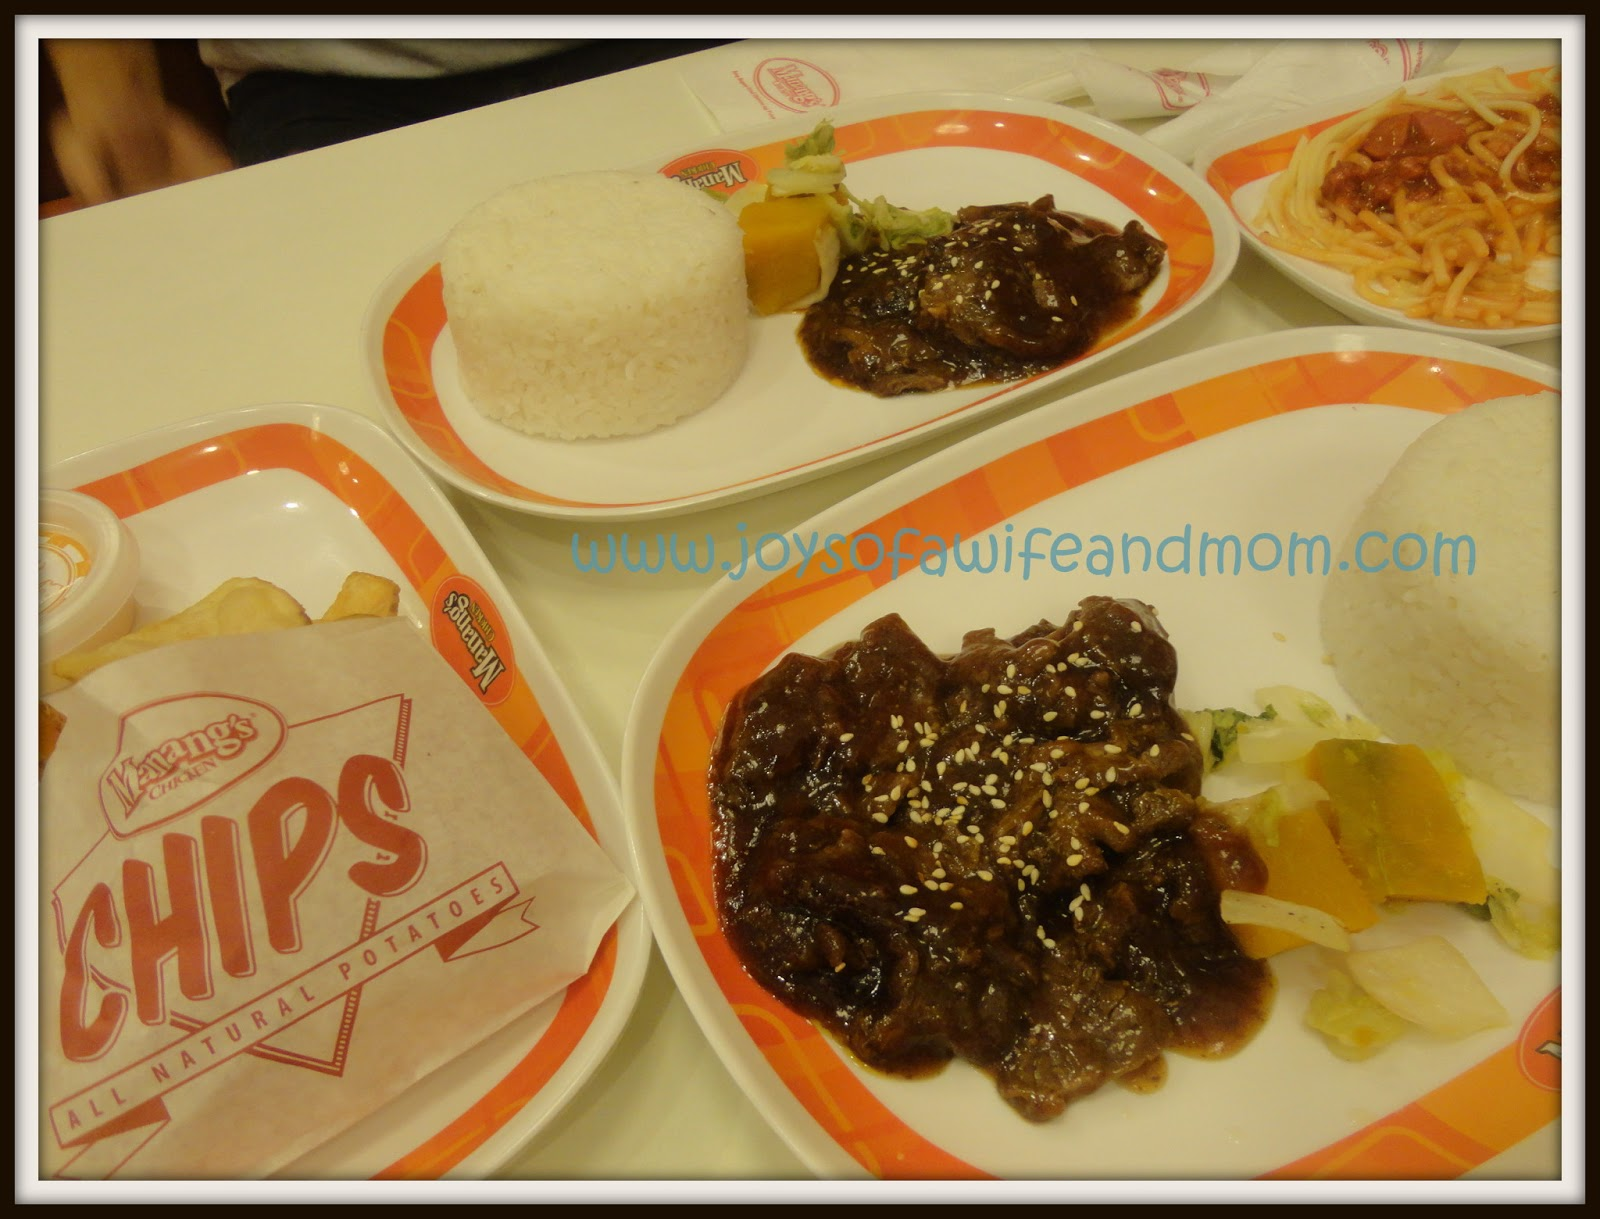 Manang's Chicken